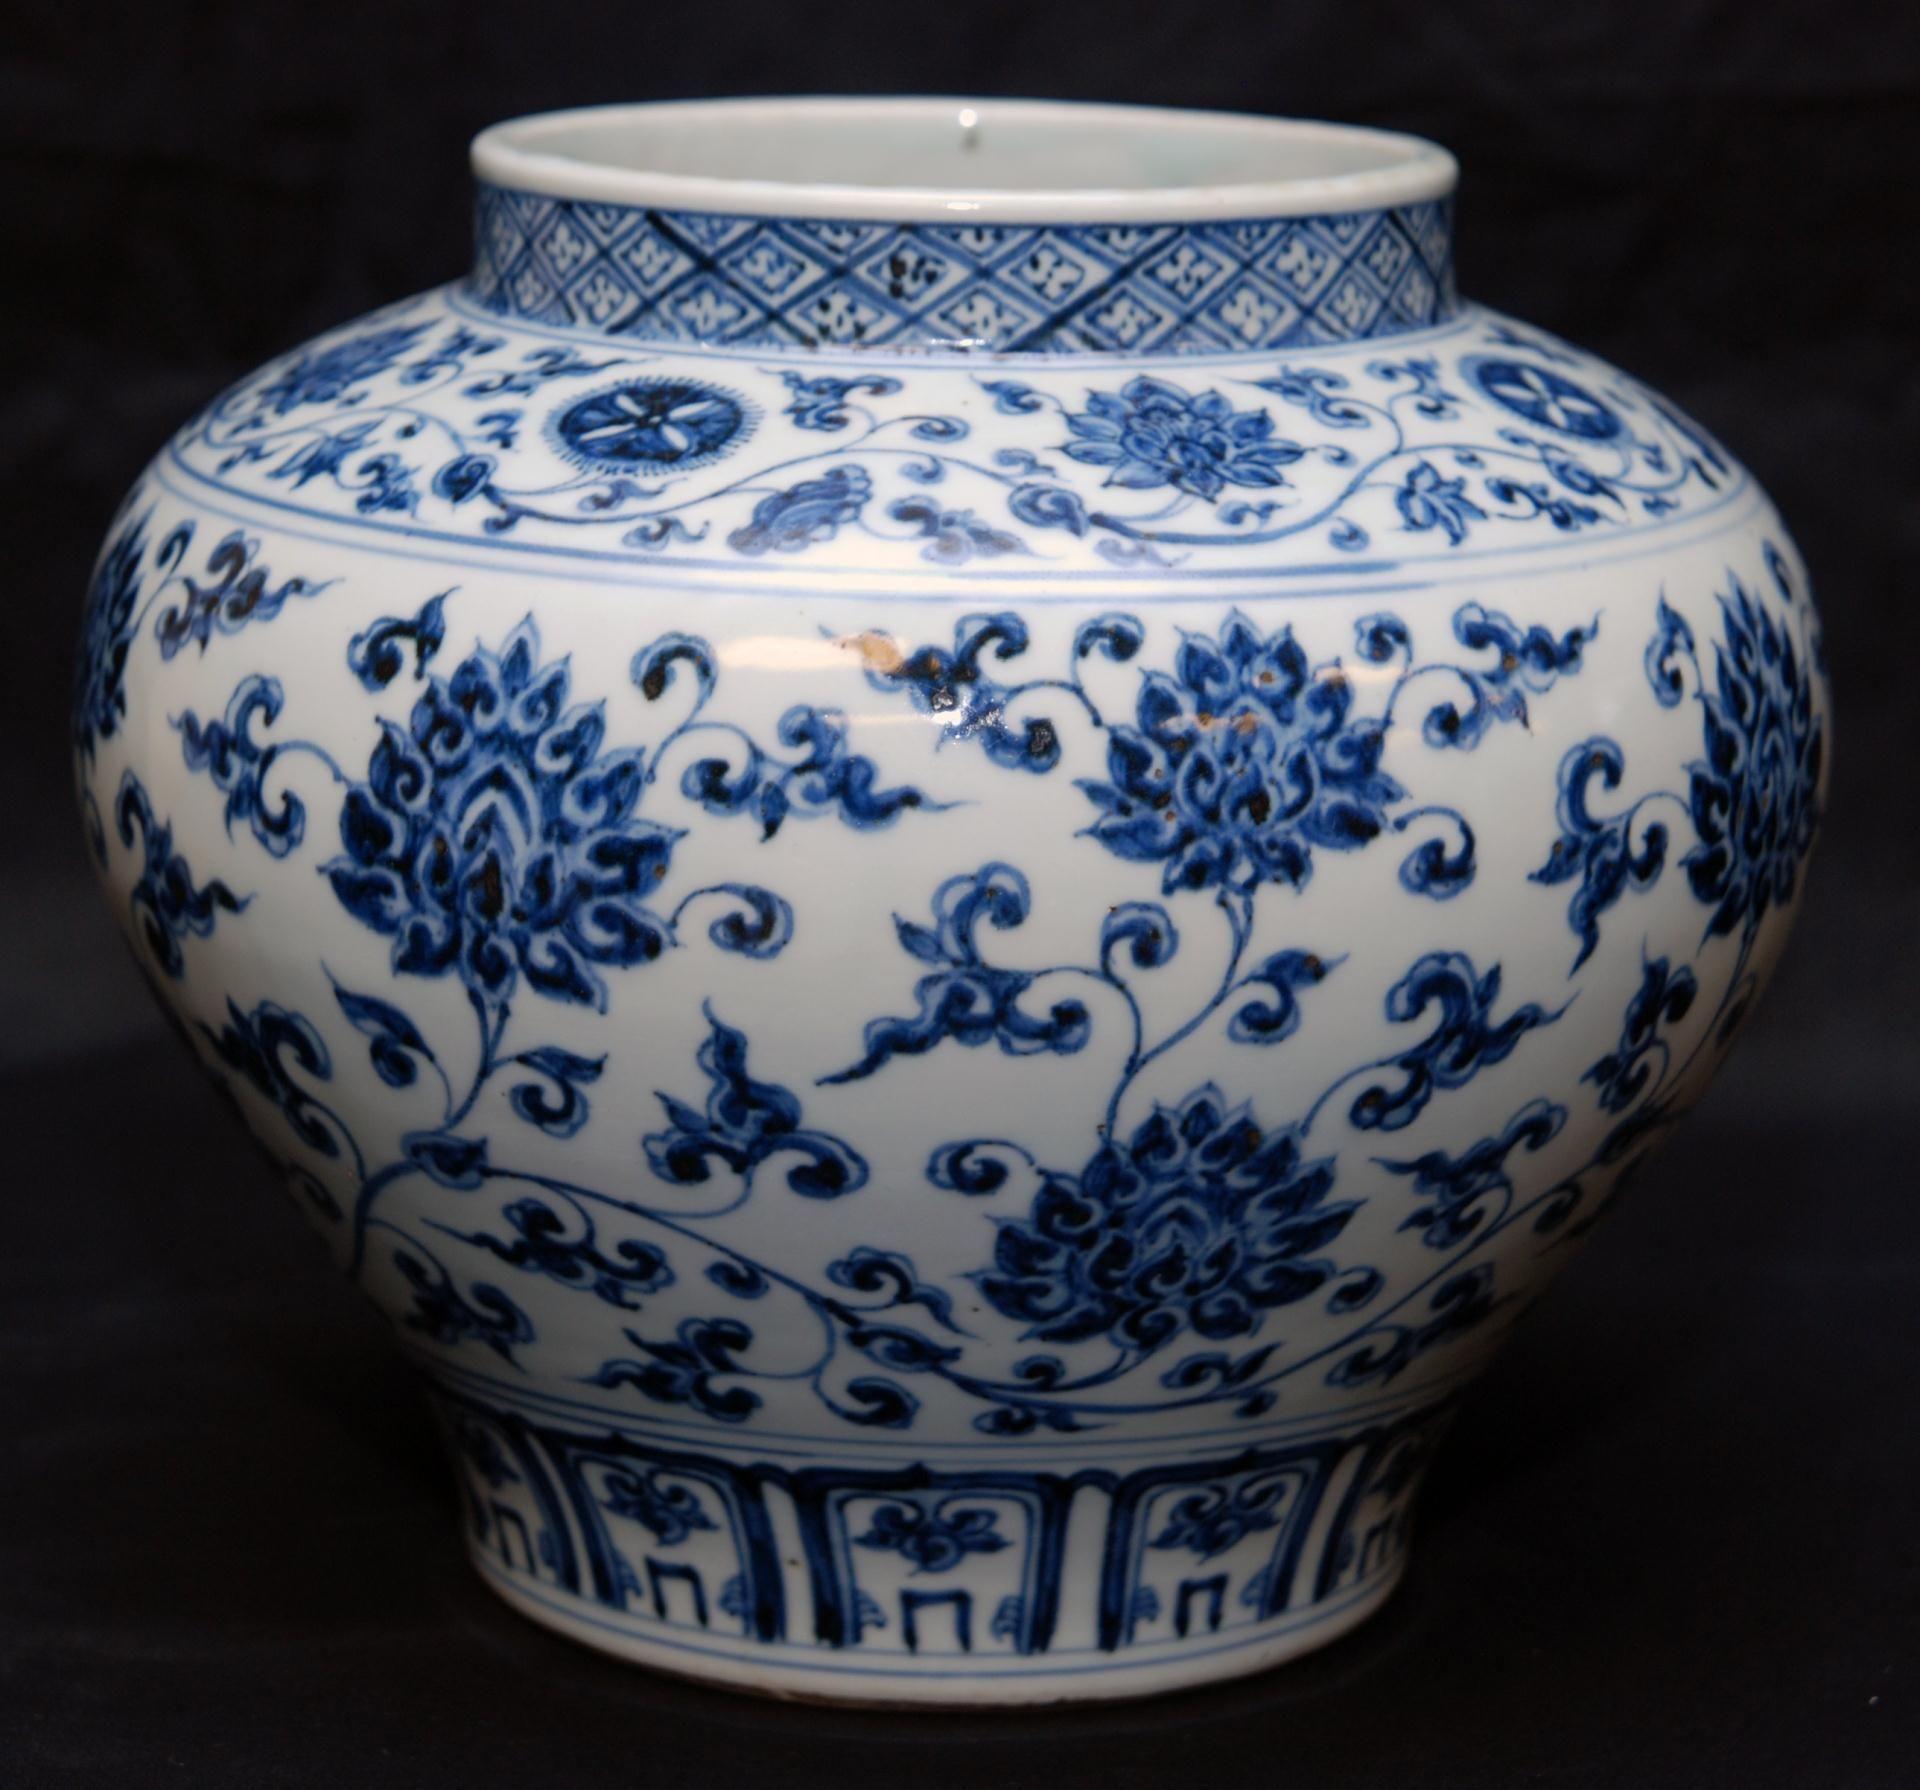 Blue ceramics paintings google search muhteem nler blue ceramics paintings google search porcelain vasefine porcelainceramic paintingblue chinawhite reviewsmspy